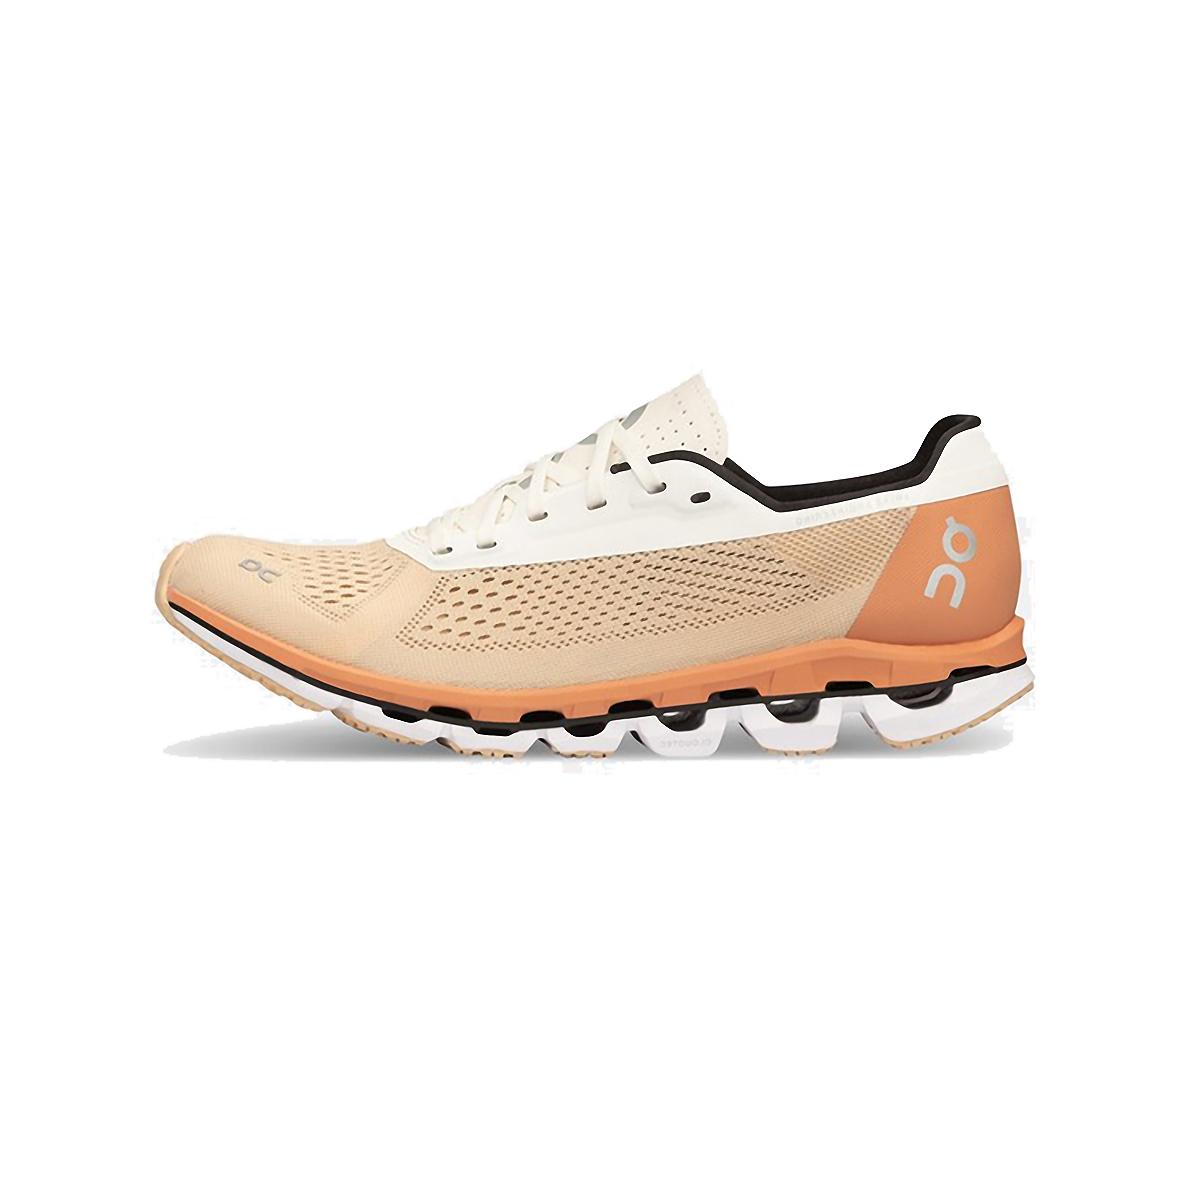 Women's On Cloudboom Running Shoe - Color: Savannah/White - Size: 5.5 - Width: Regular, Savannah/White, large, image 2